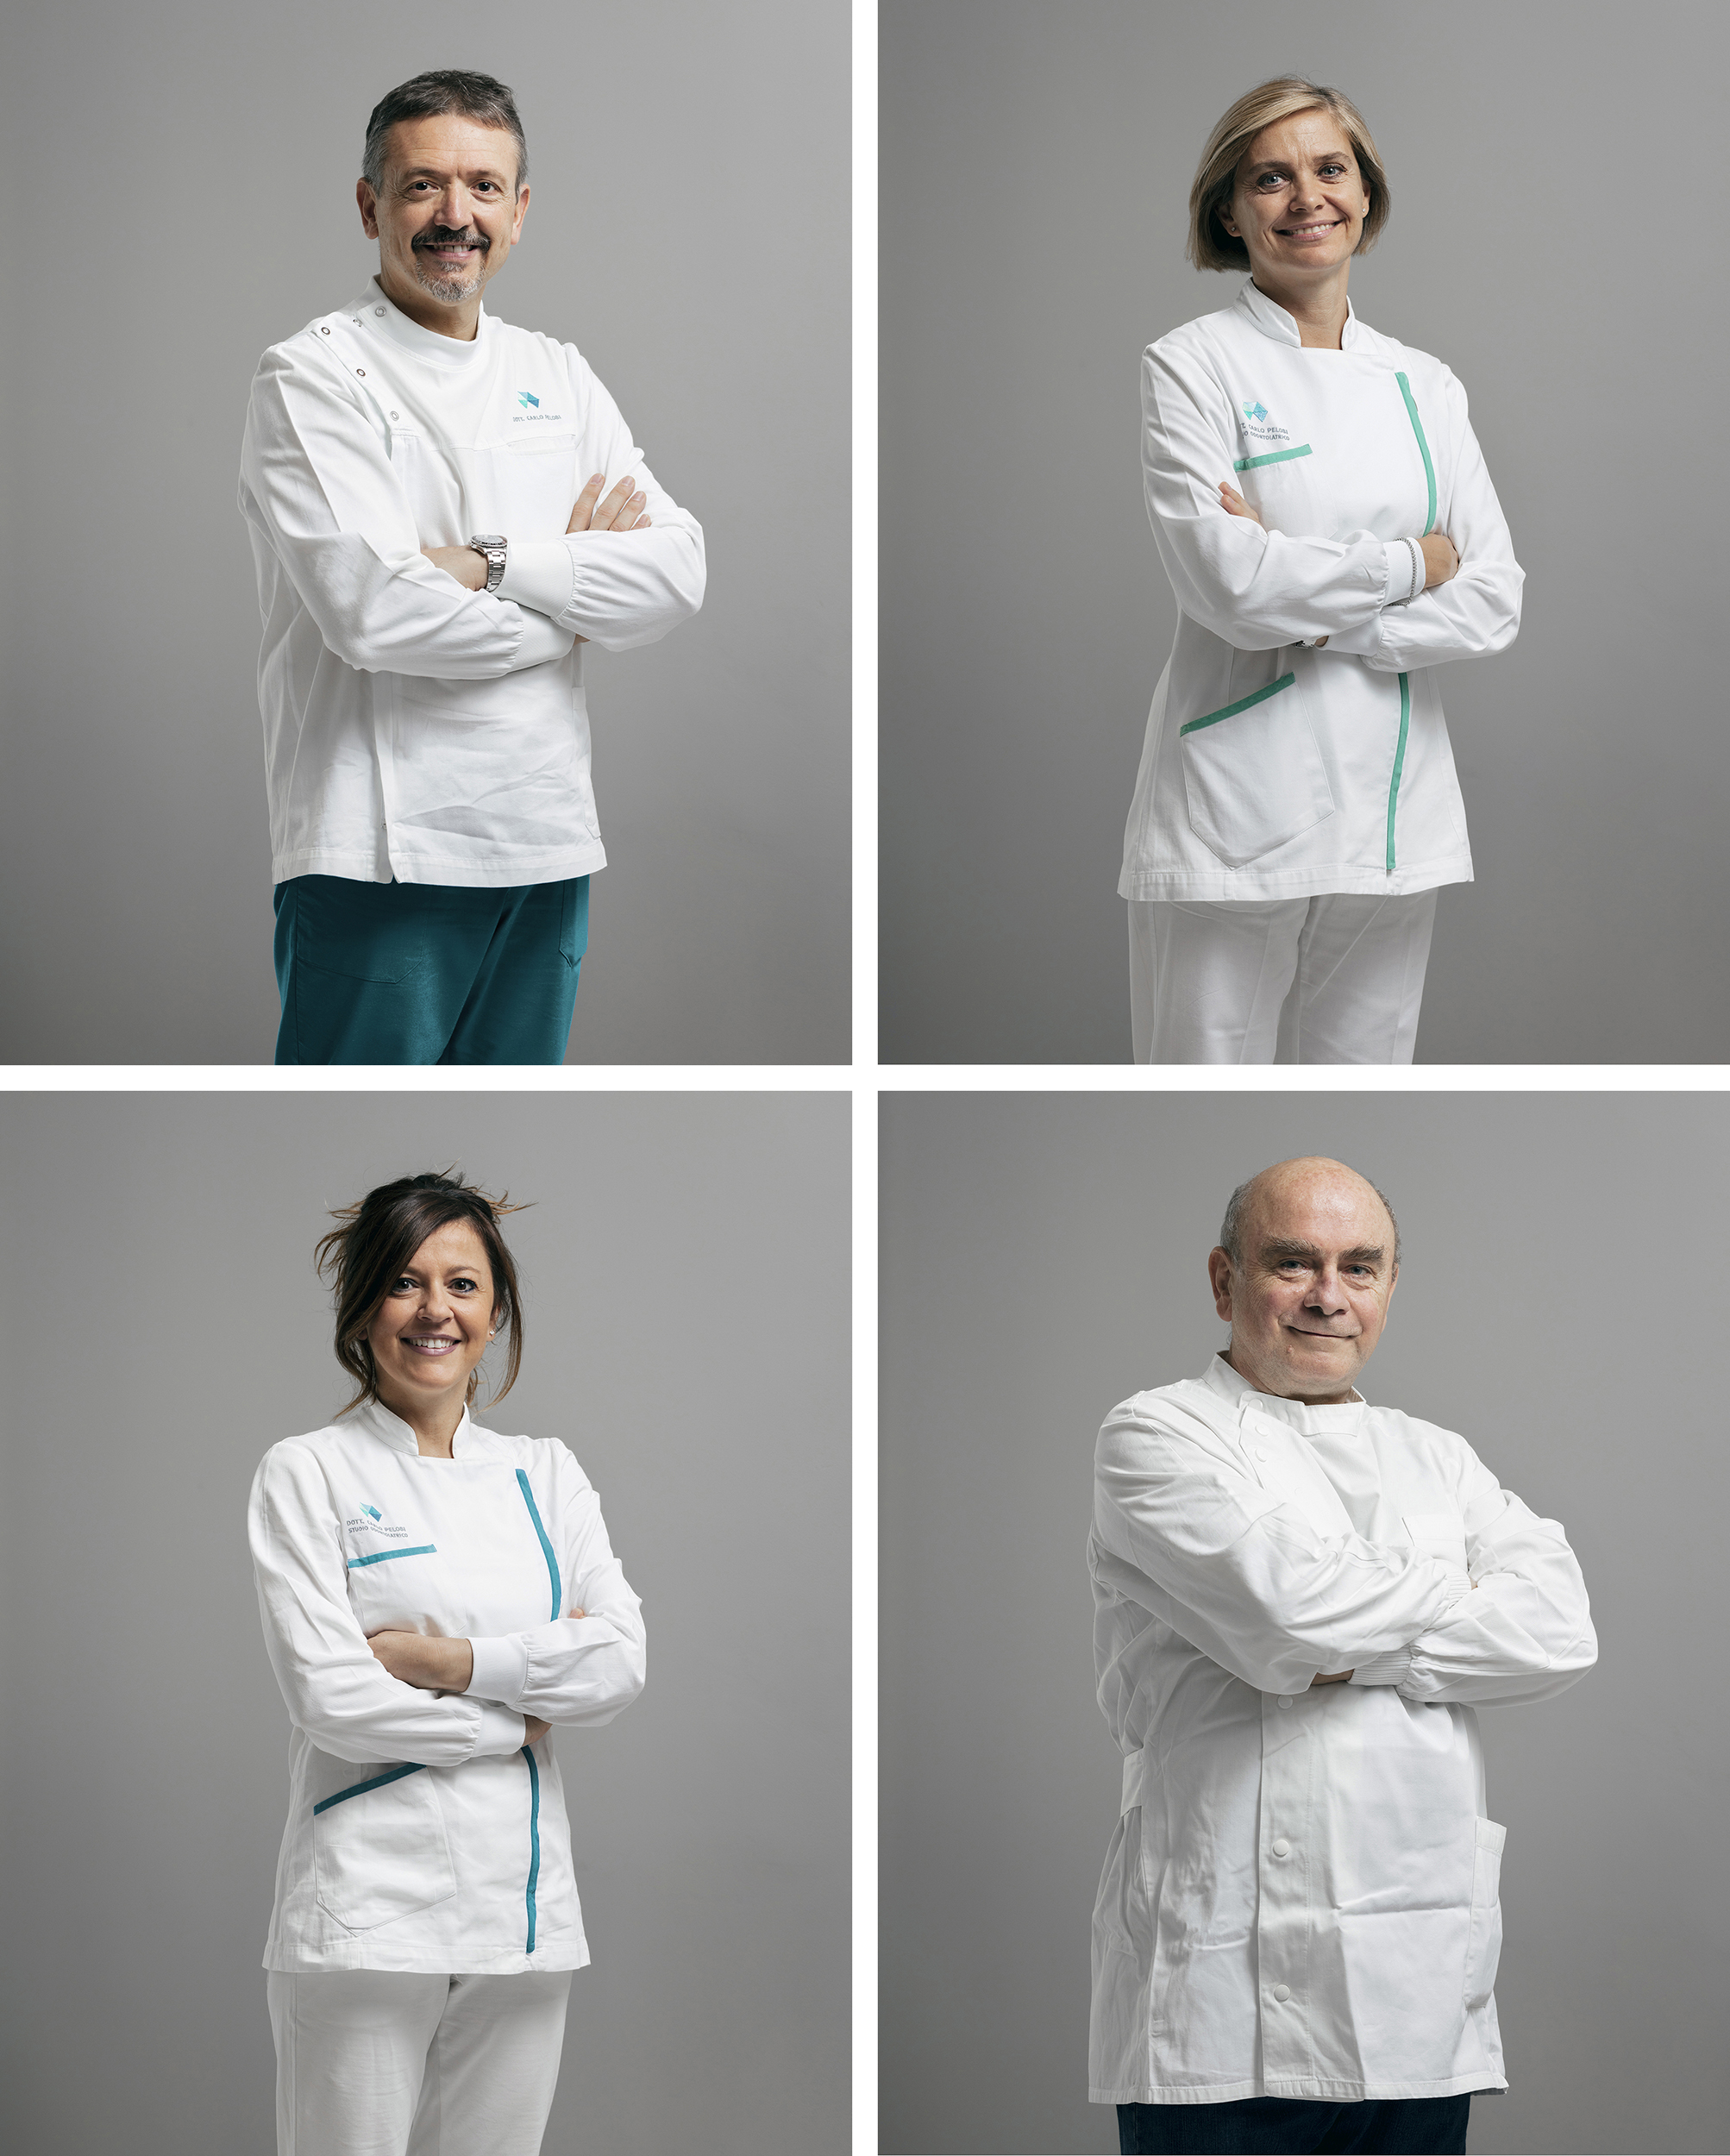 giorgio-leone-institutional-corporate-industrial-Carlo-Pelosi-staff-01.jpg